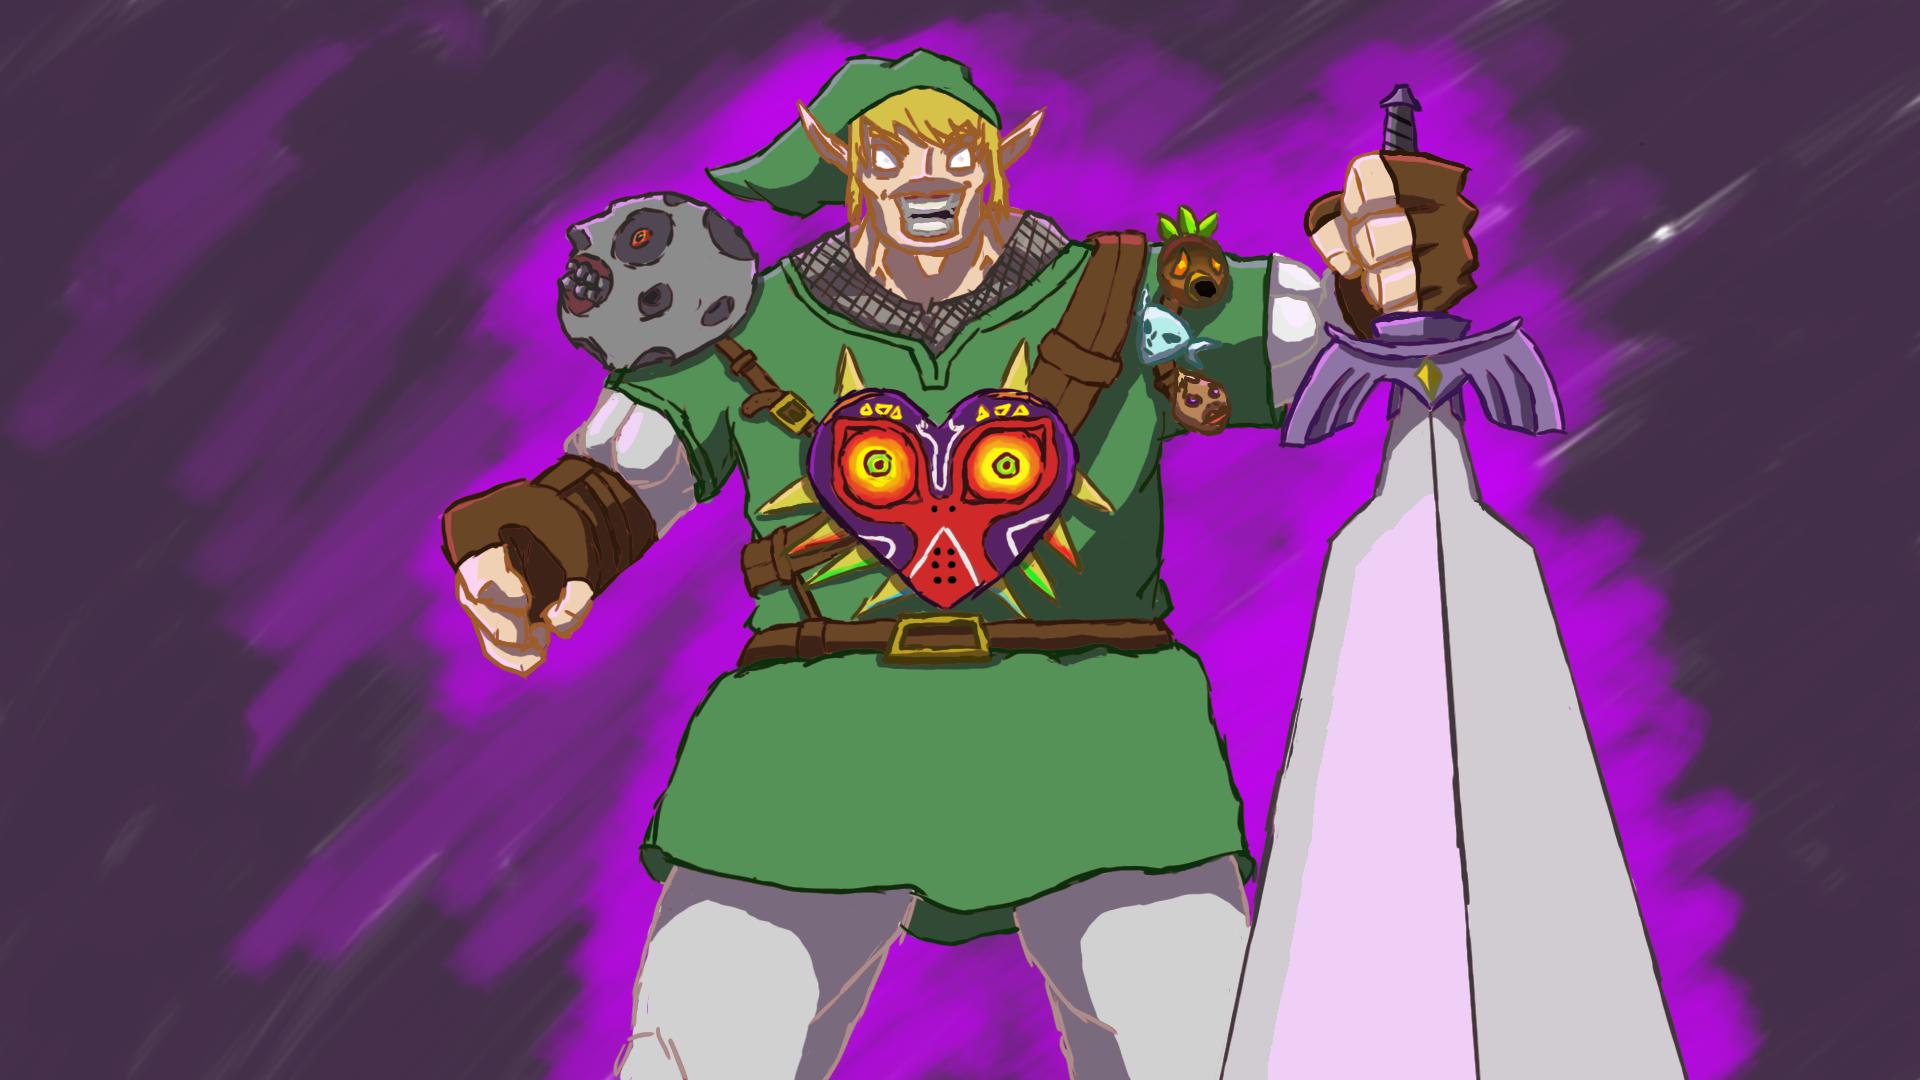 Link levelcap